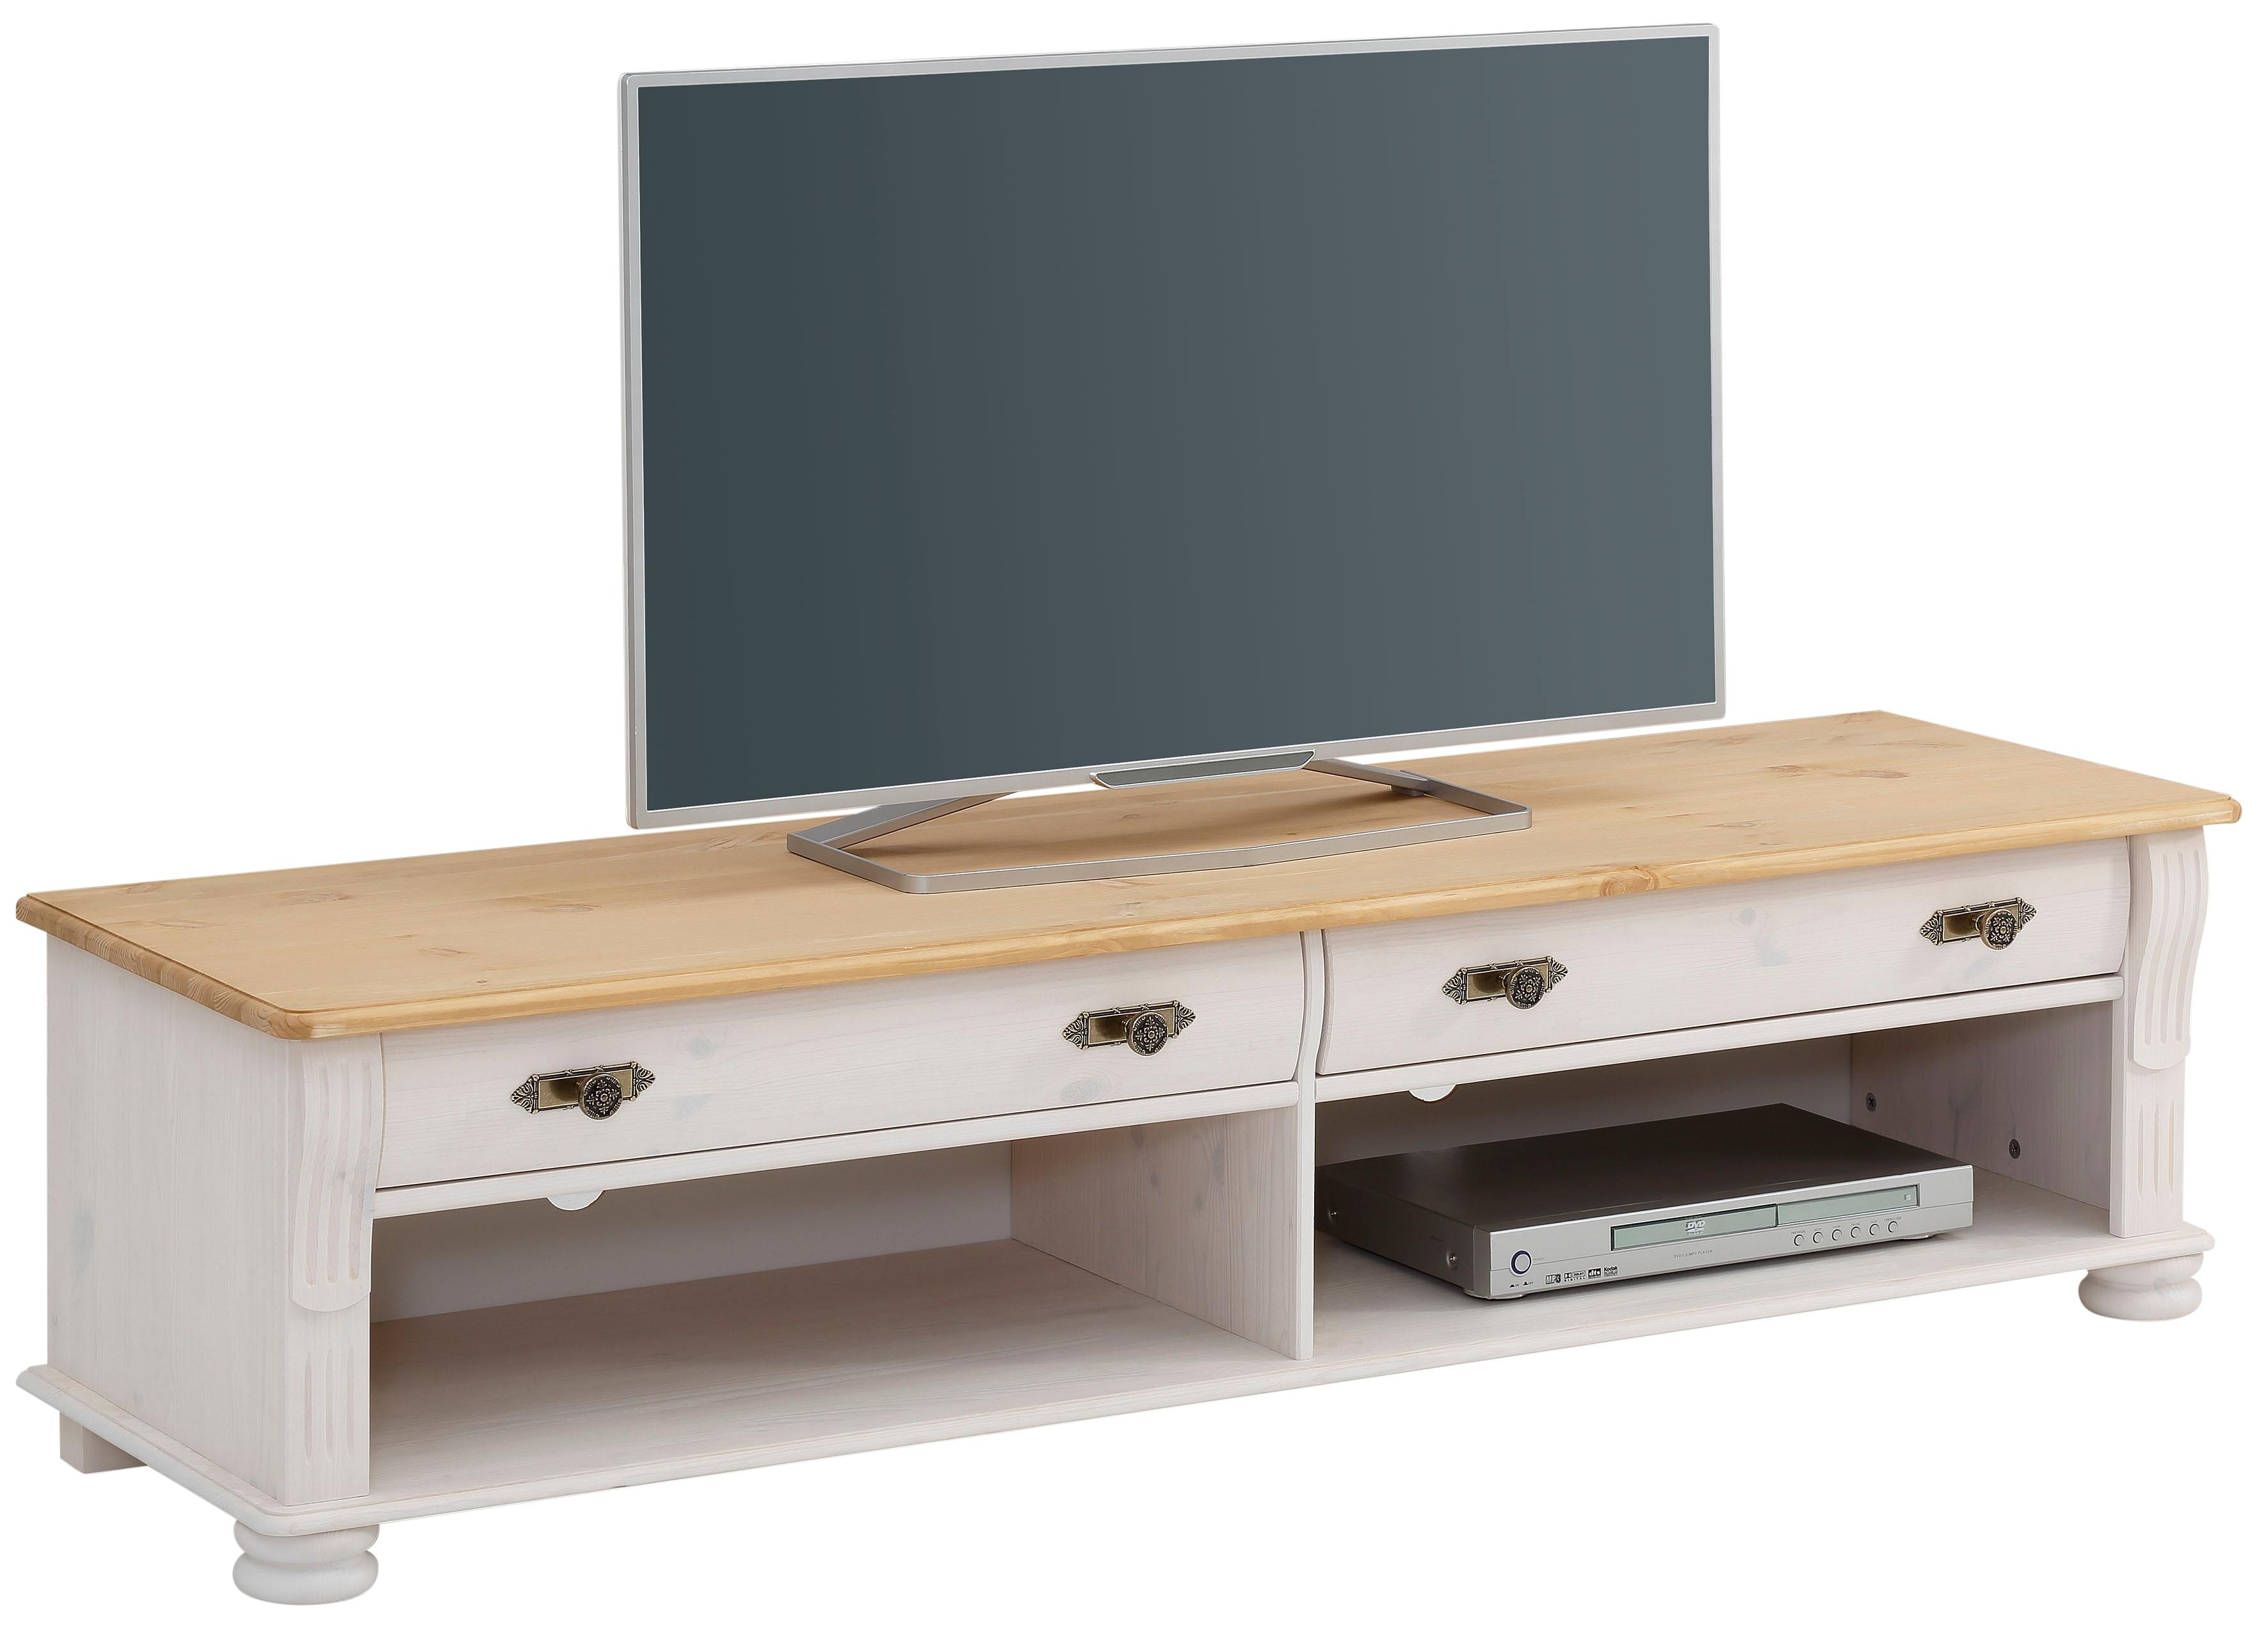 Home affaire TV-Board Susanna